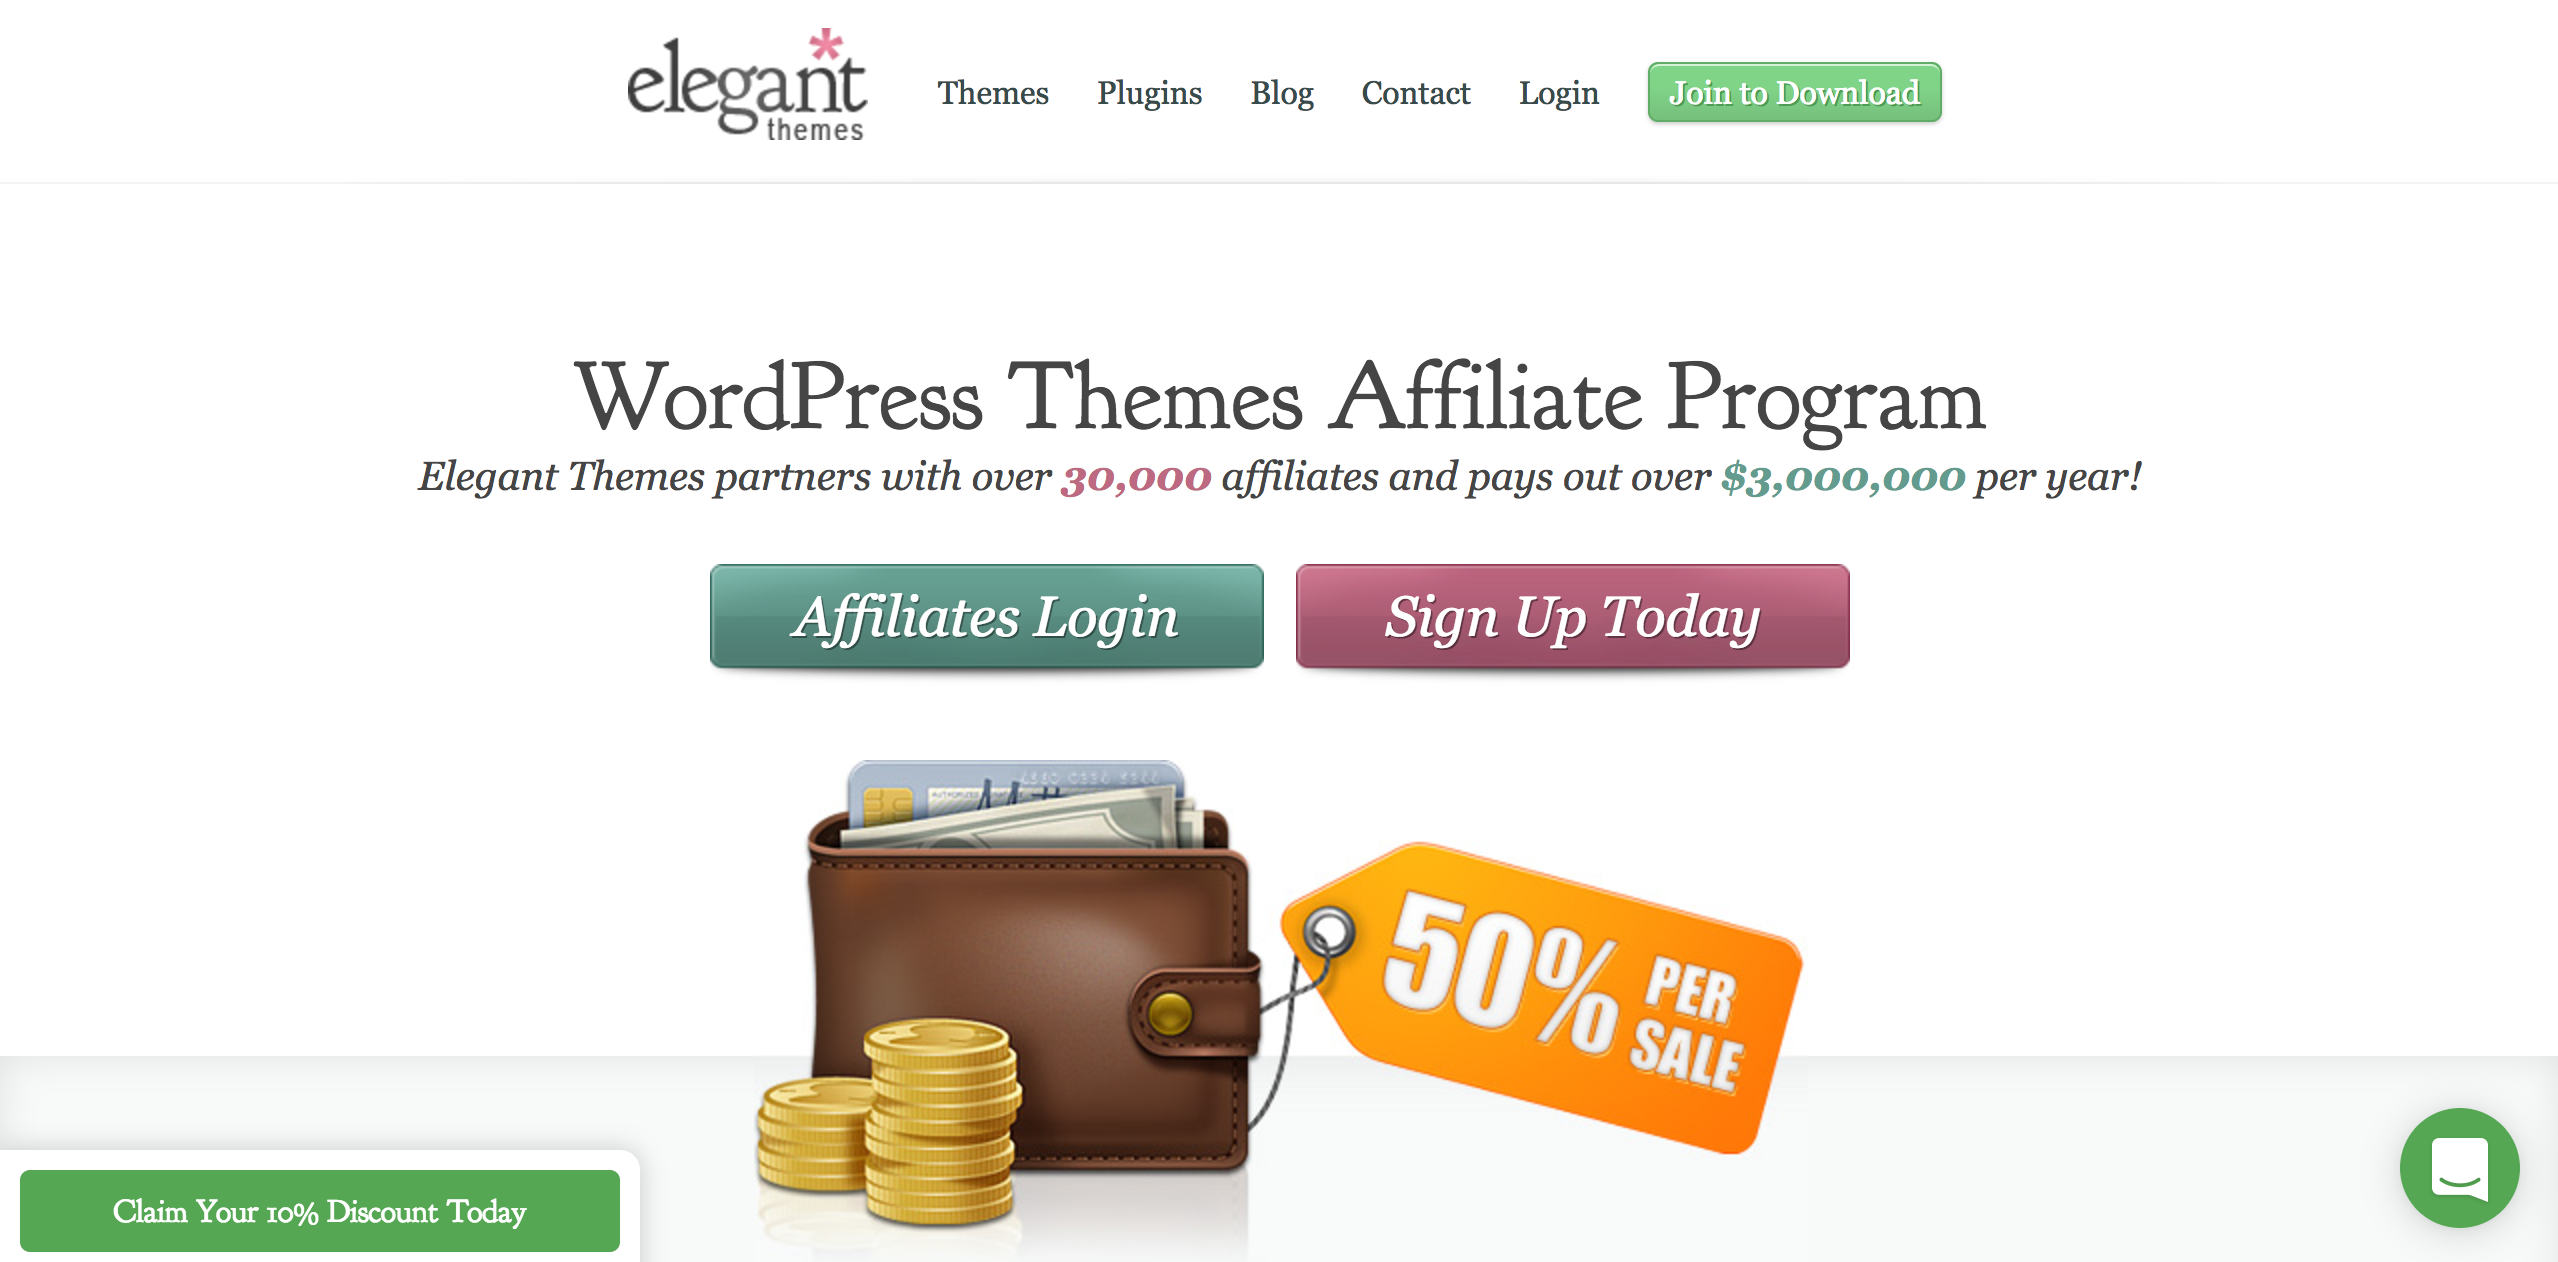 Elegant Themes Wordpress Affiliate Program